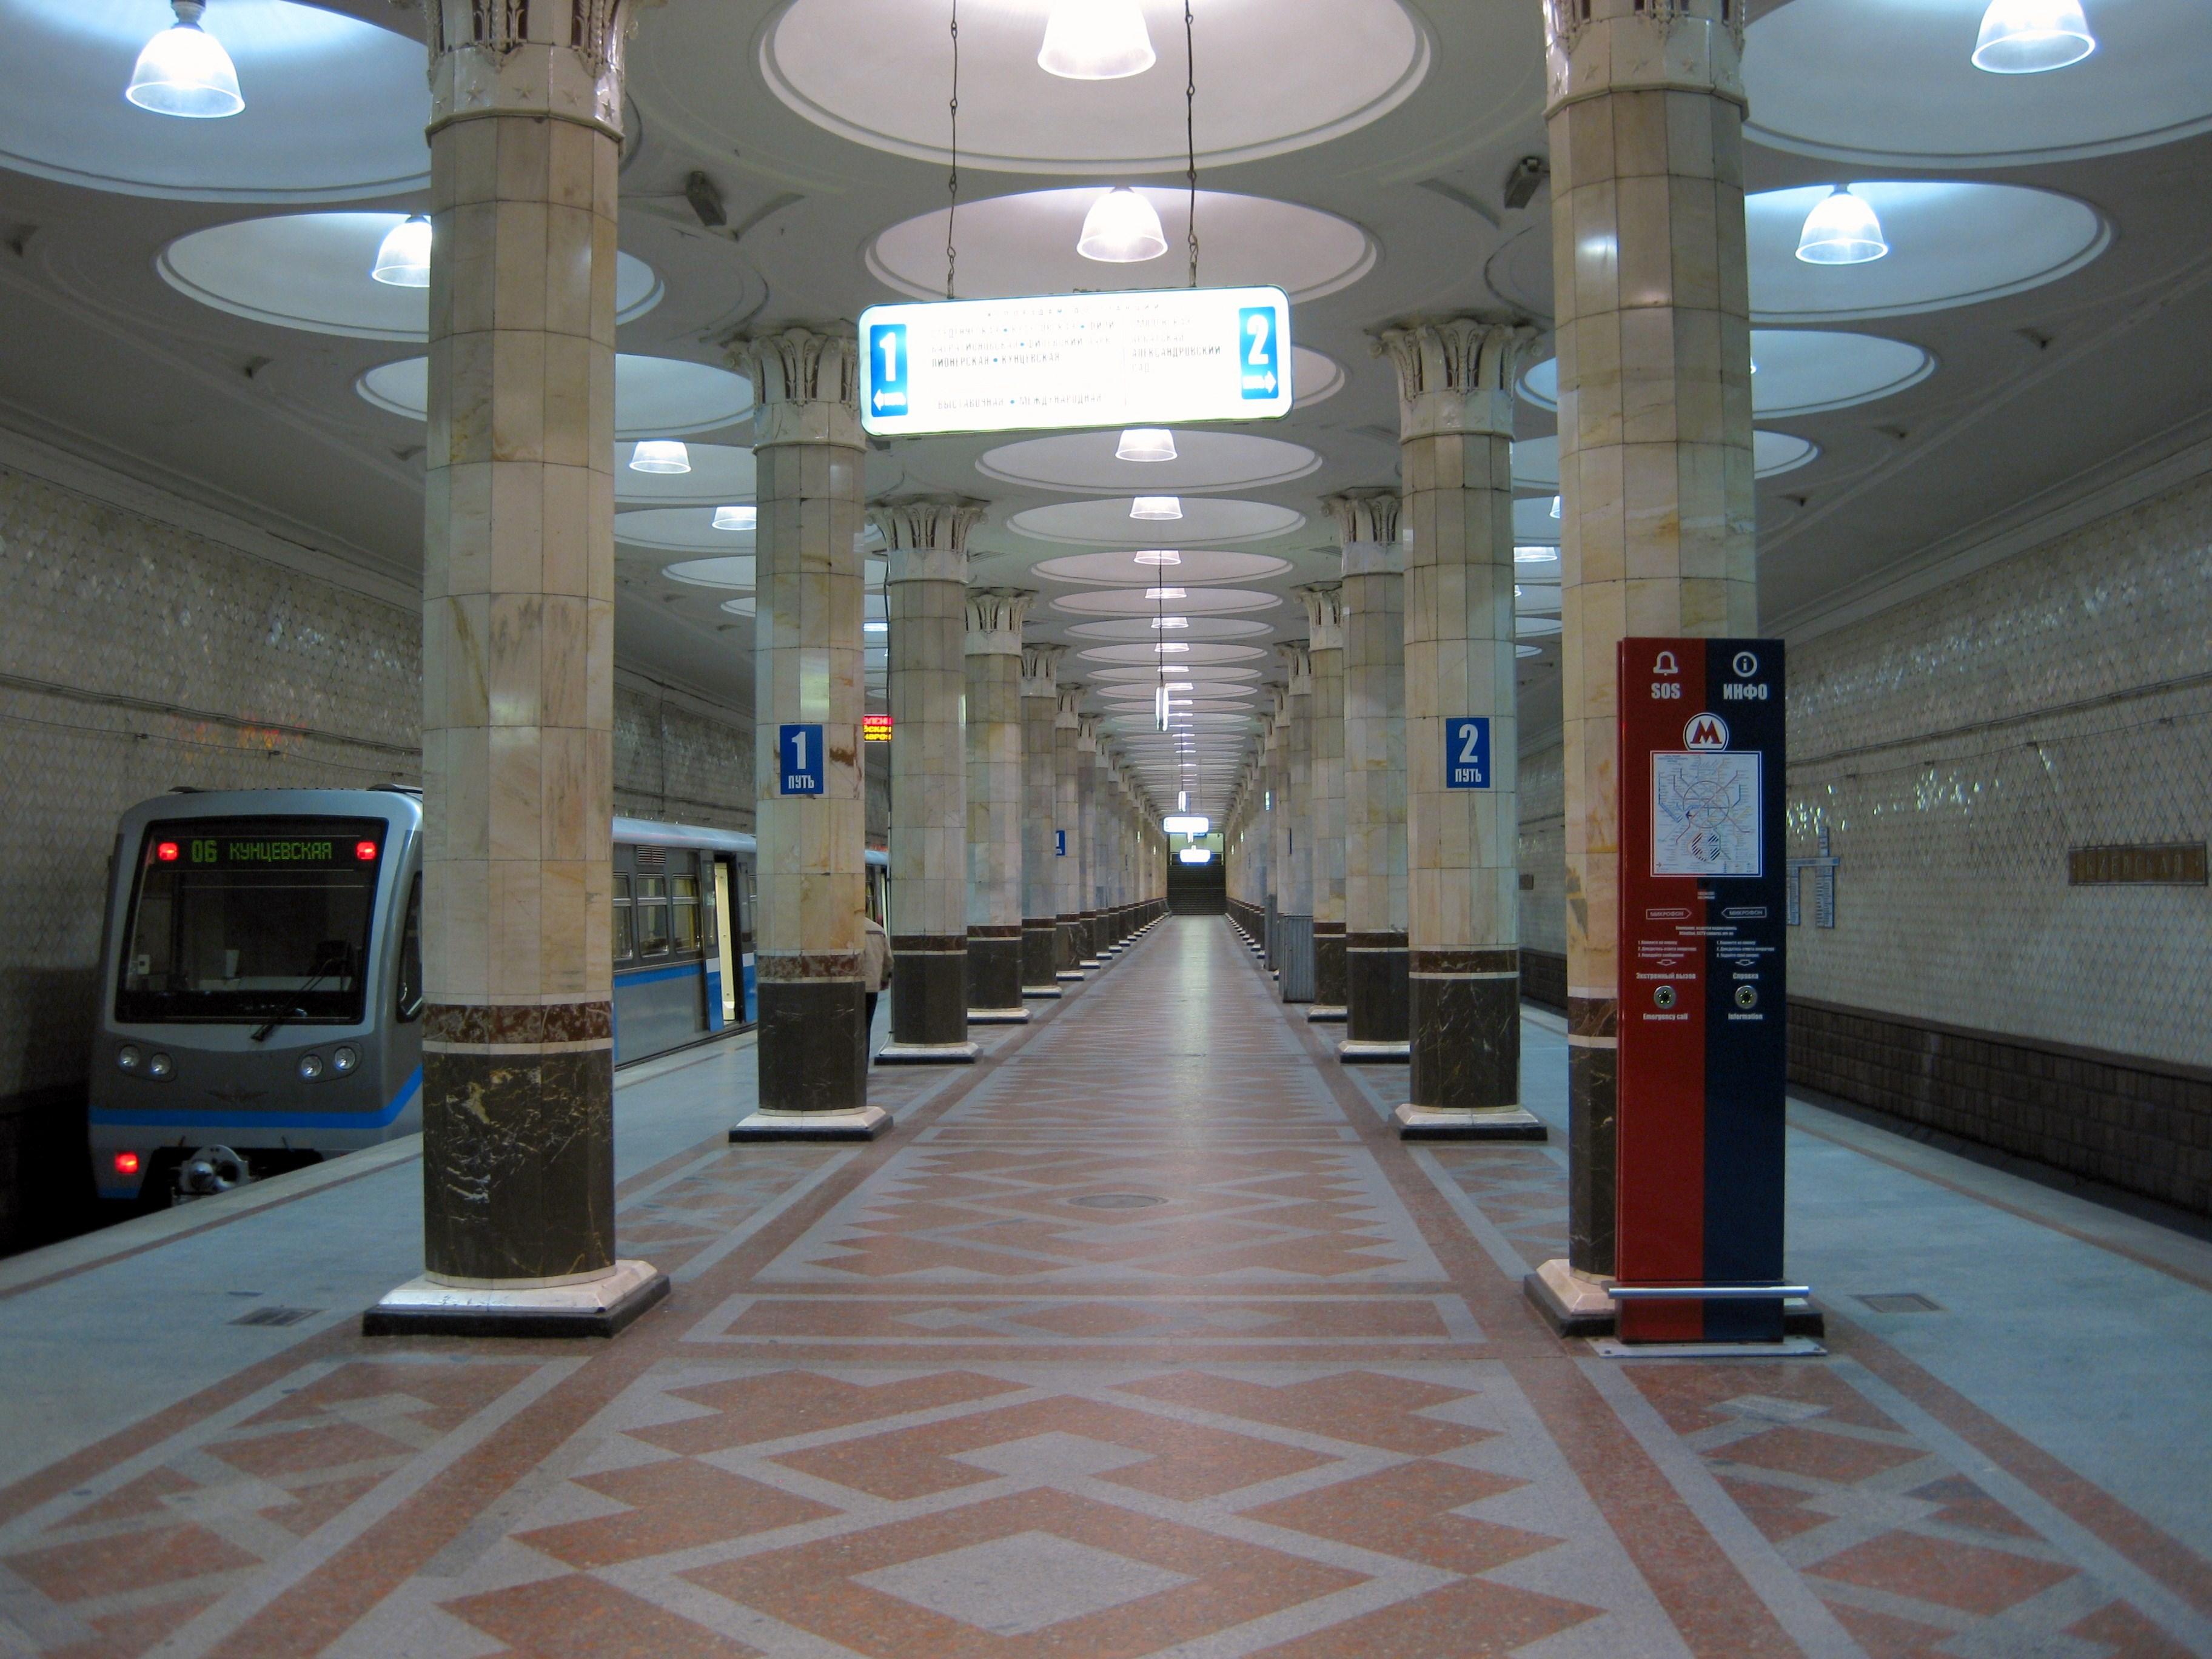 Kievskaya Station - Opened c.1935 - Soviet Russia Metro System